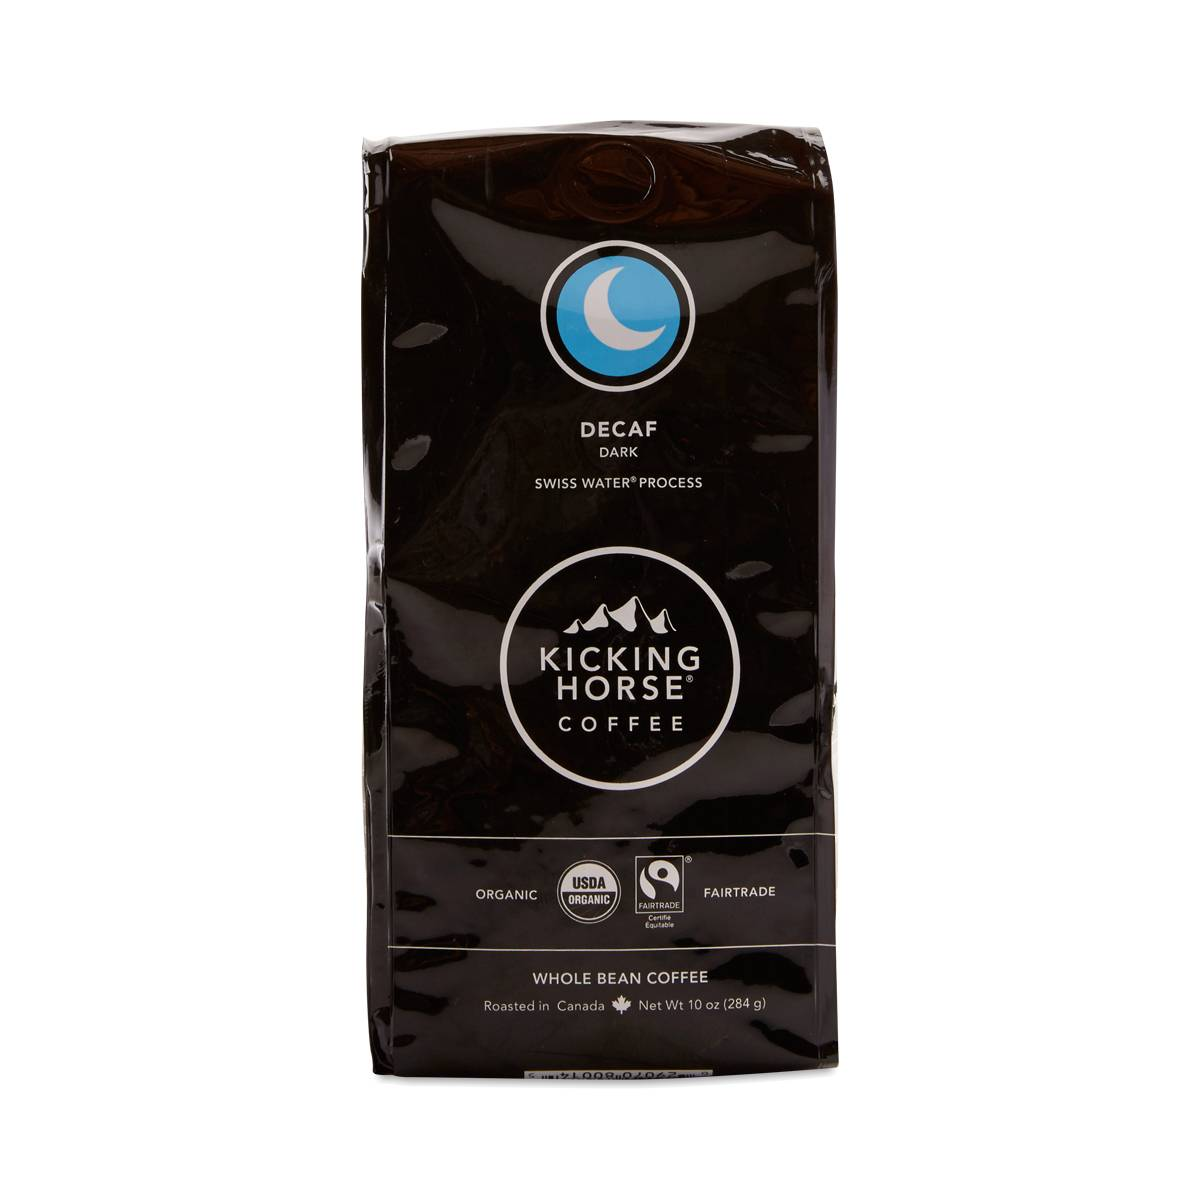 Organic Dark Decaf Whole Bean Coffee By Kicking Horse